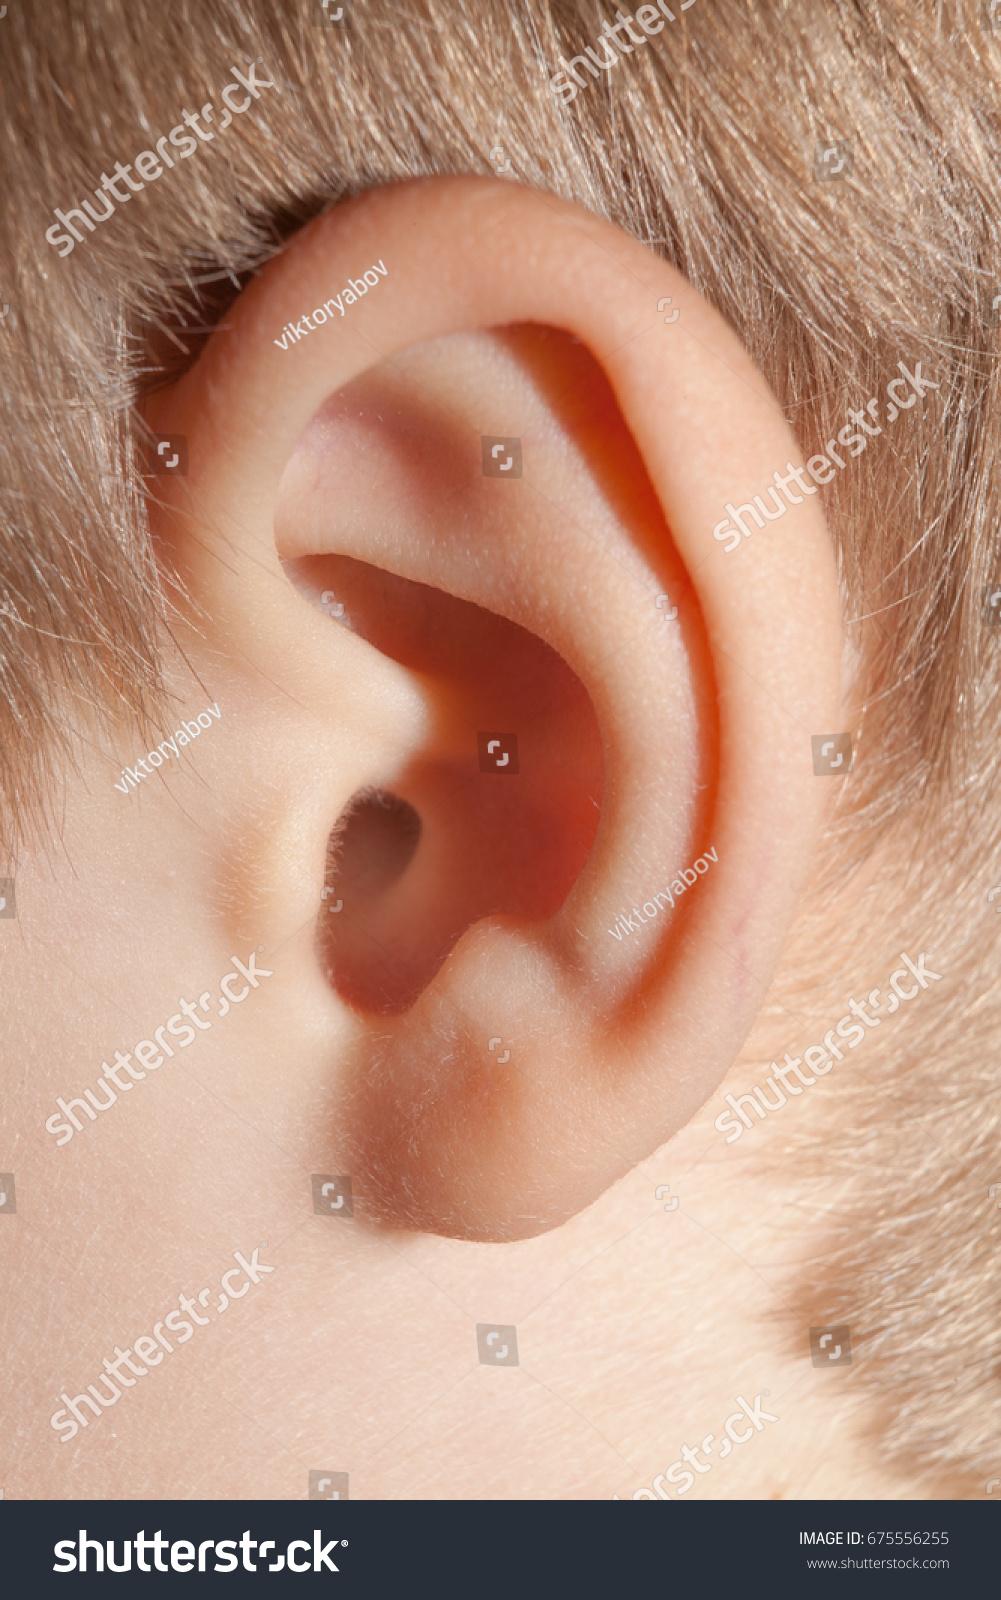 Human Ear Body Parts Anatomy Closeup Stock Photo (Royalty Free ...